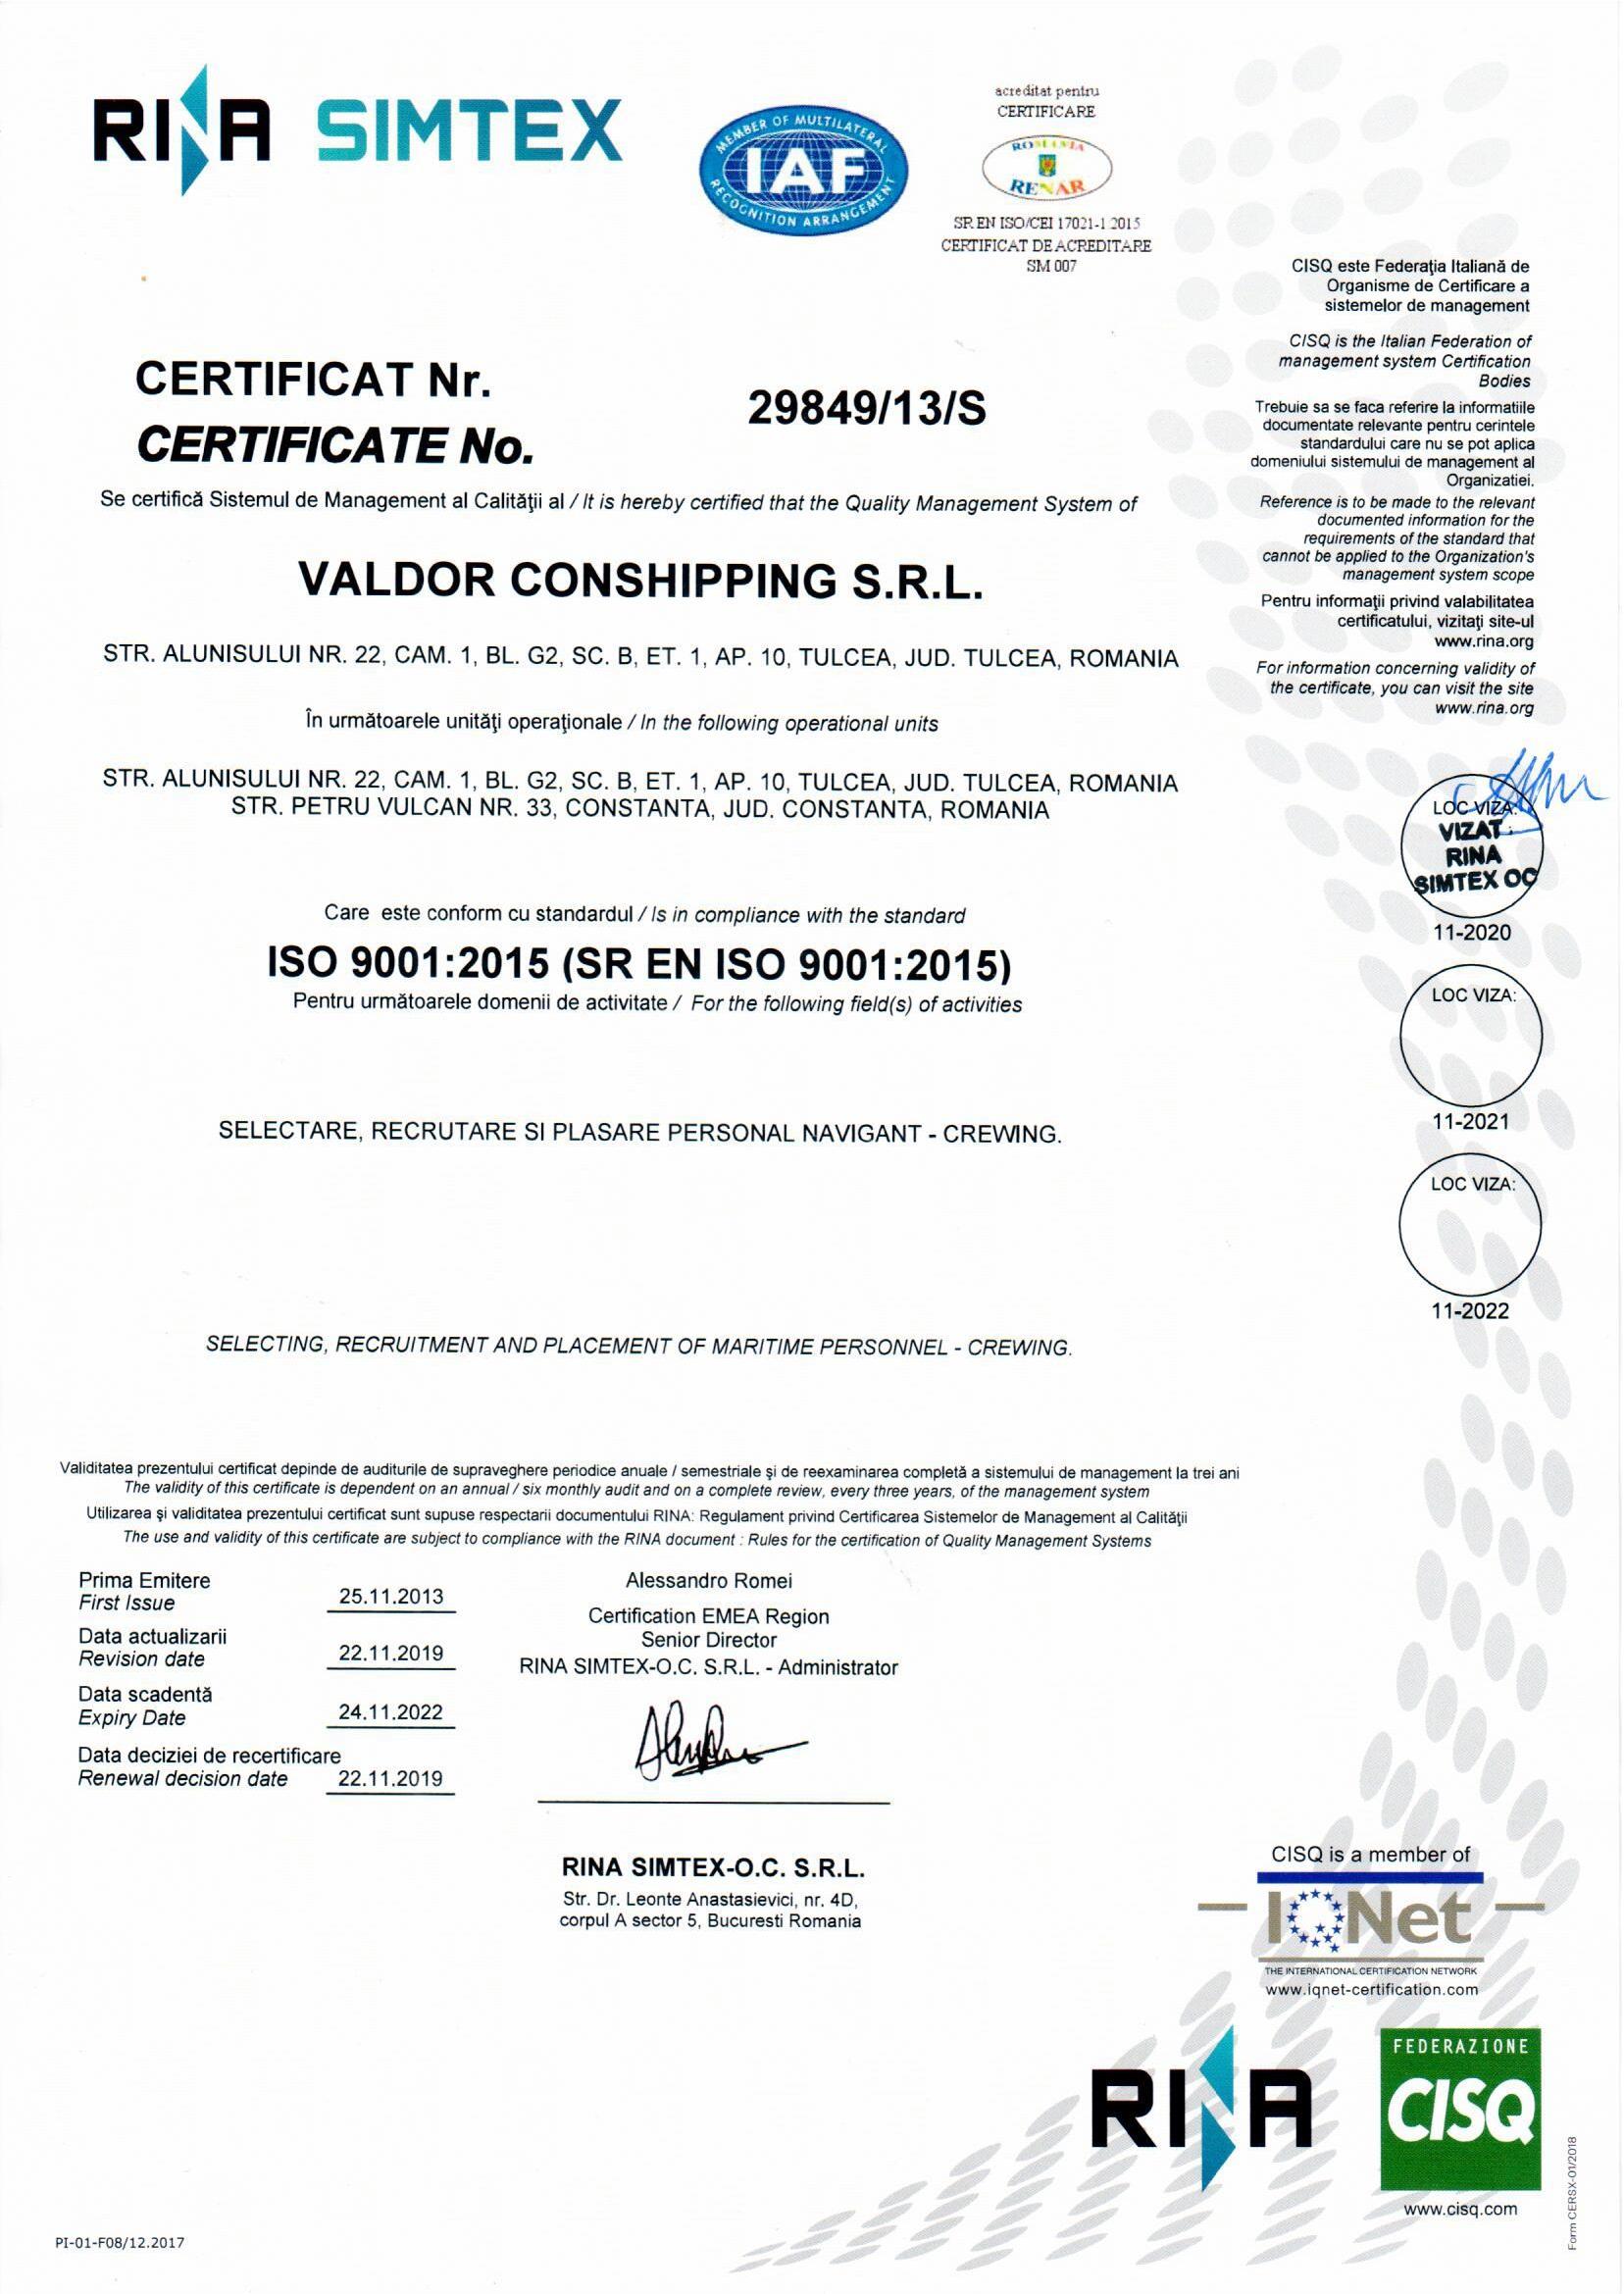 RINA ISO 9001:2015 CERTICATE